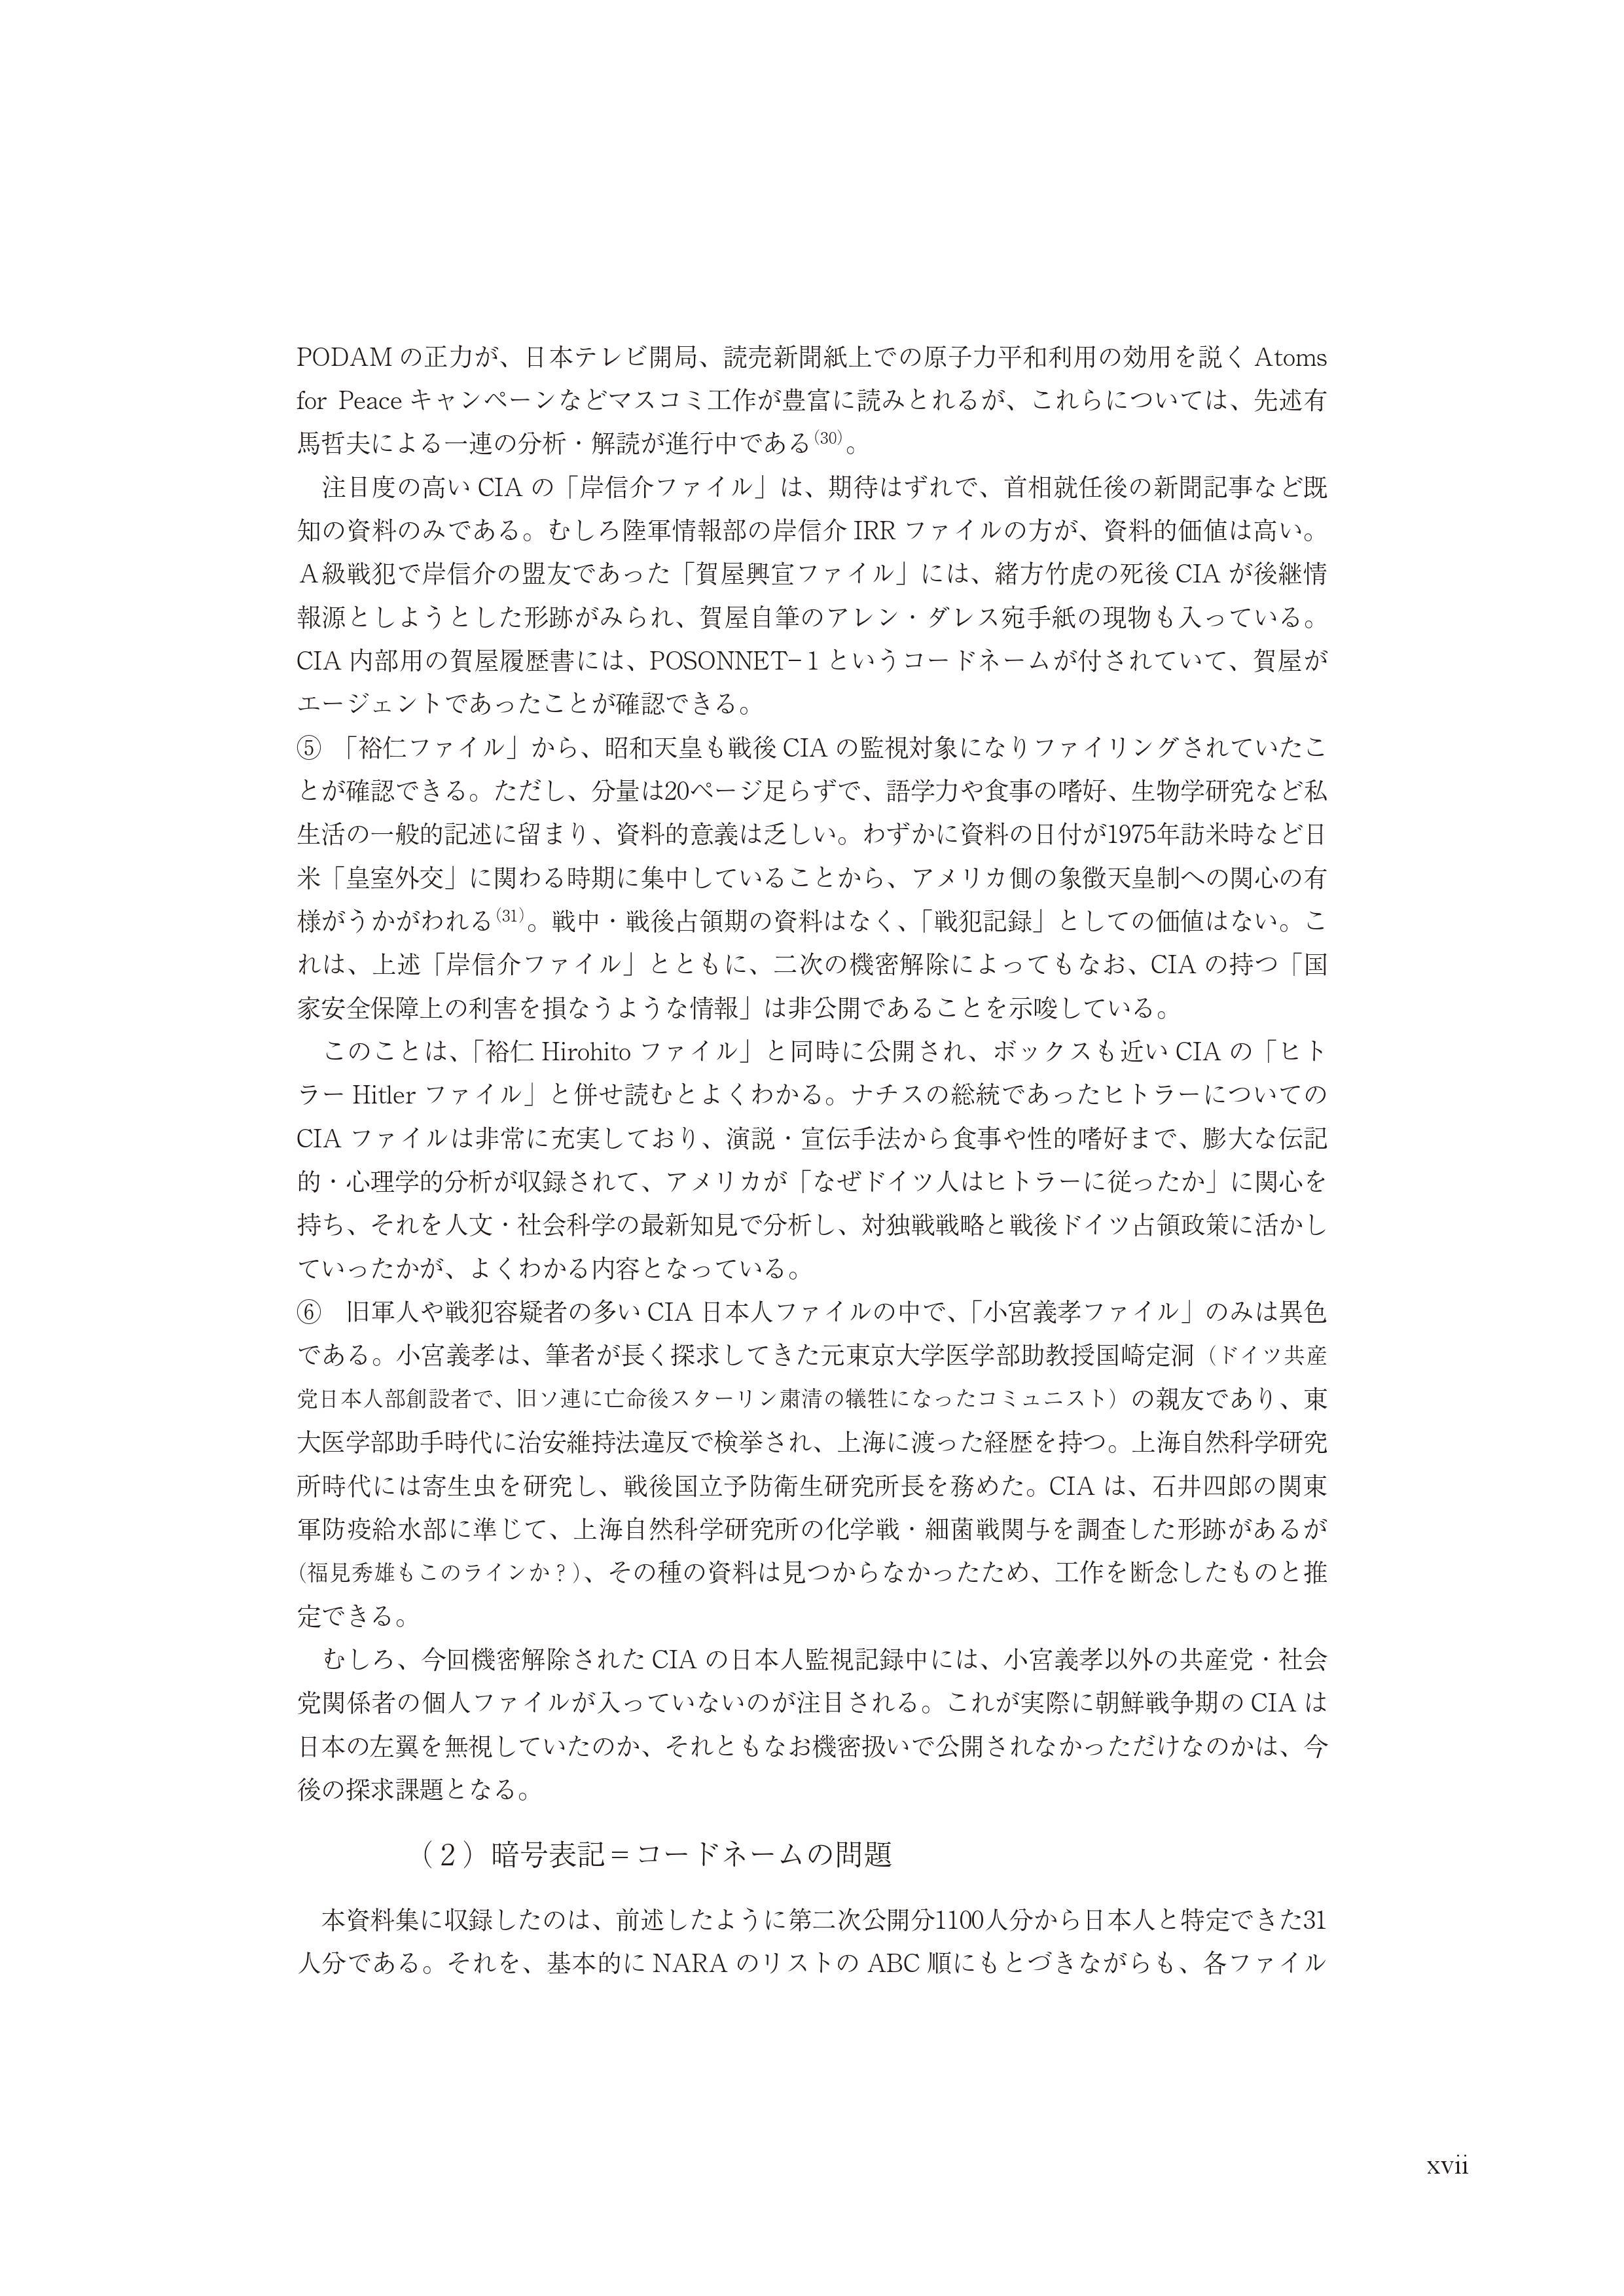 CIA日本人ファイル0001 (17)